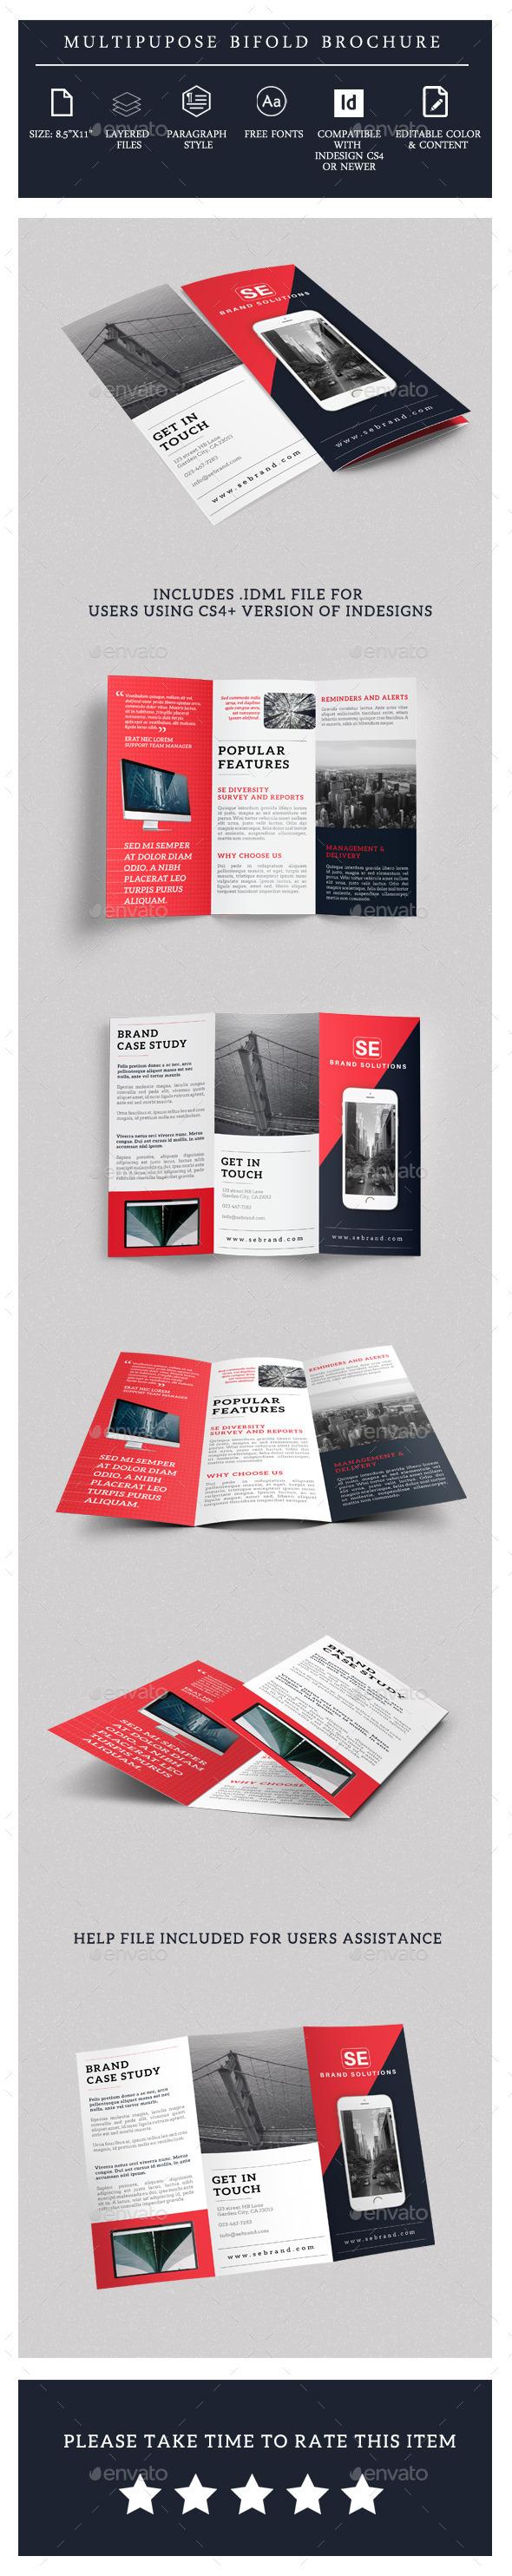 Modern TriFold Brochure Template - Brochures Print Templates